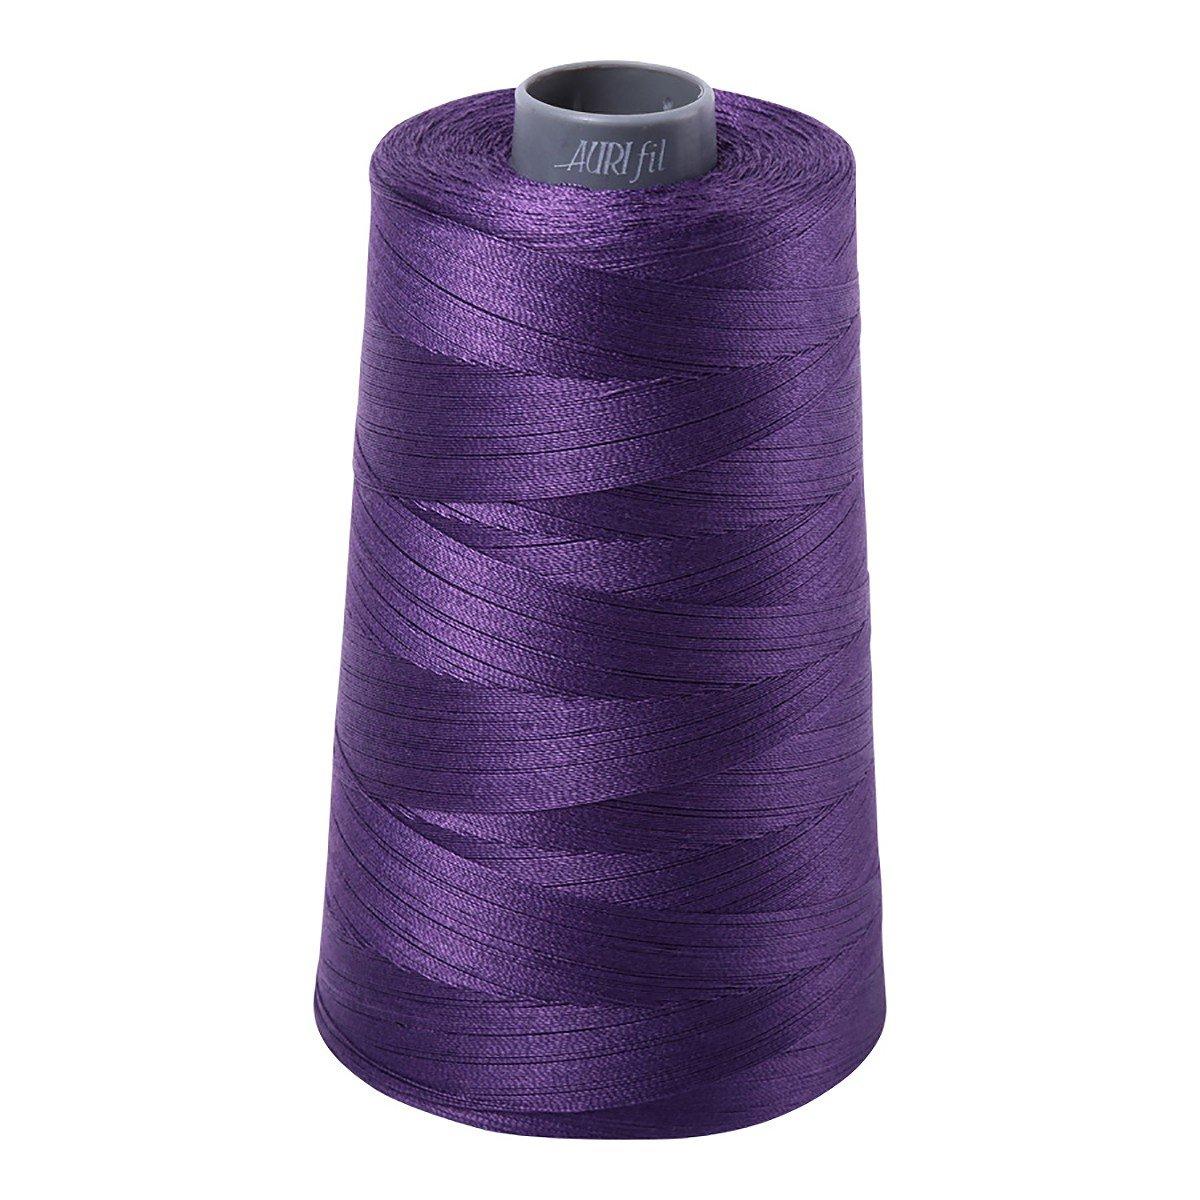 Mako (Cotton) Embroidery Thread 28wt 3609yds Eggplant